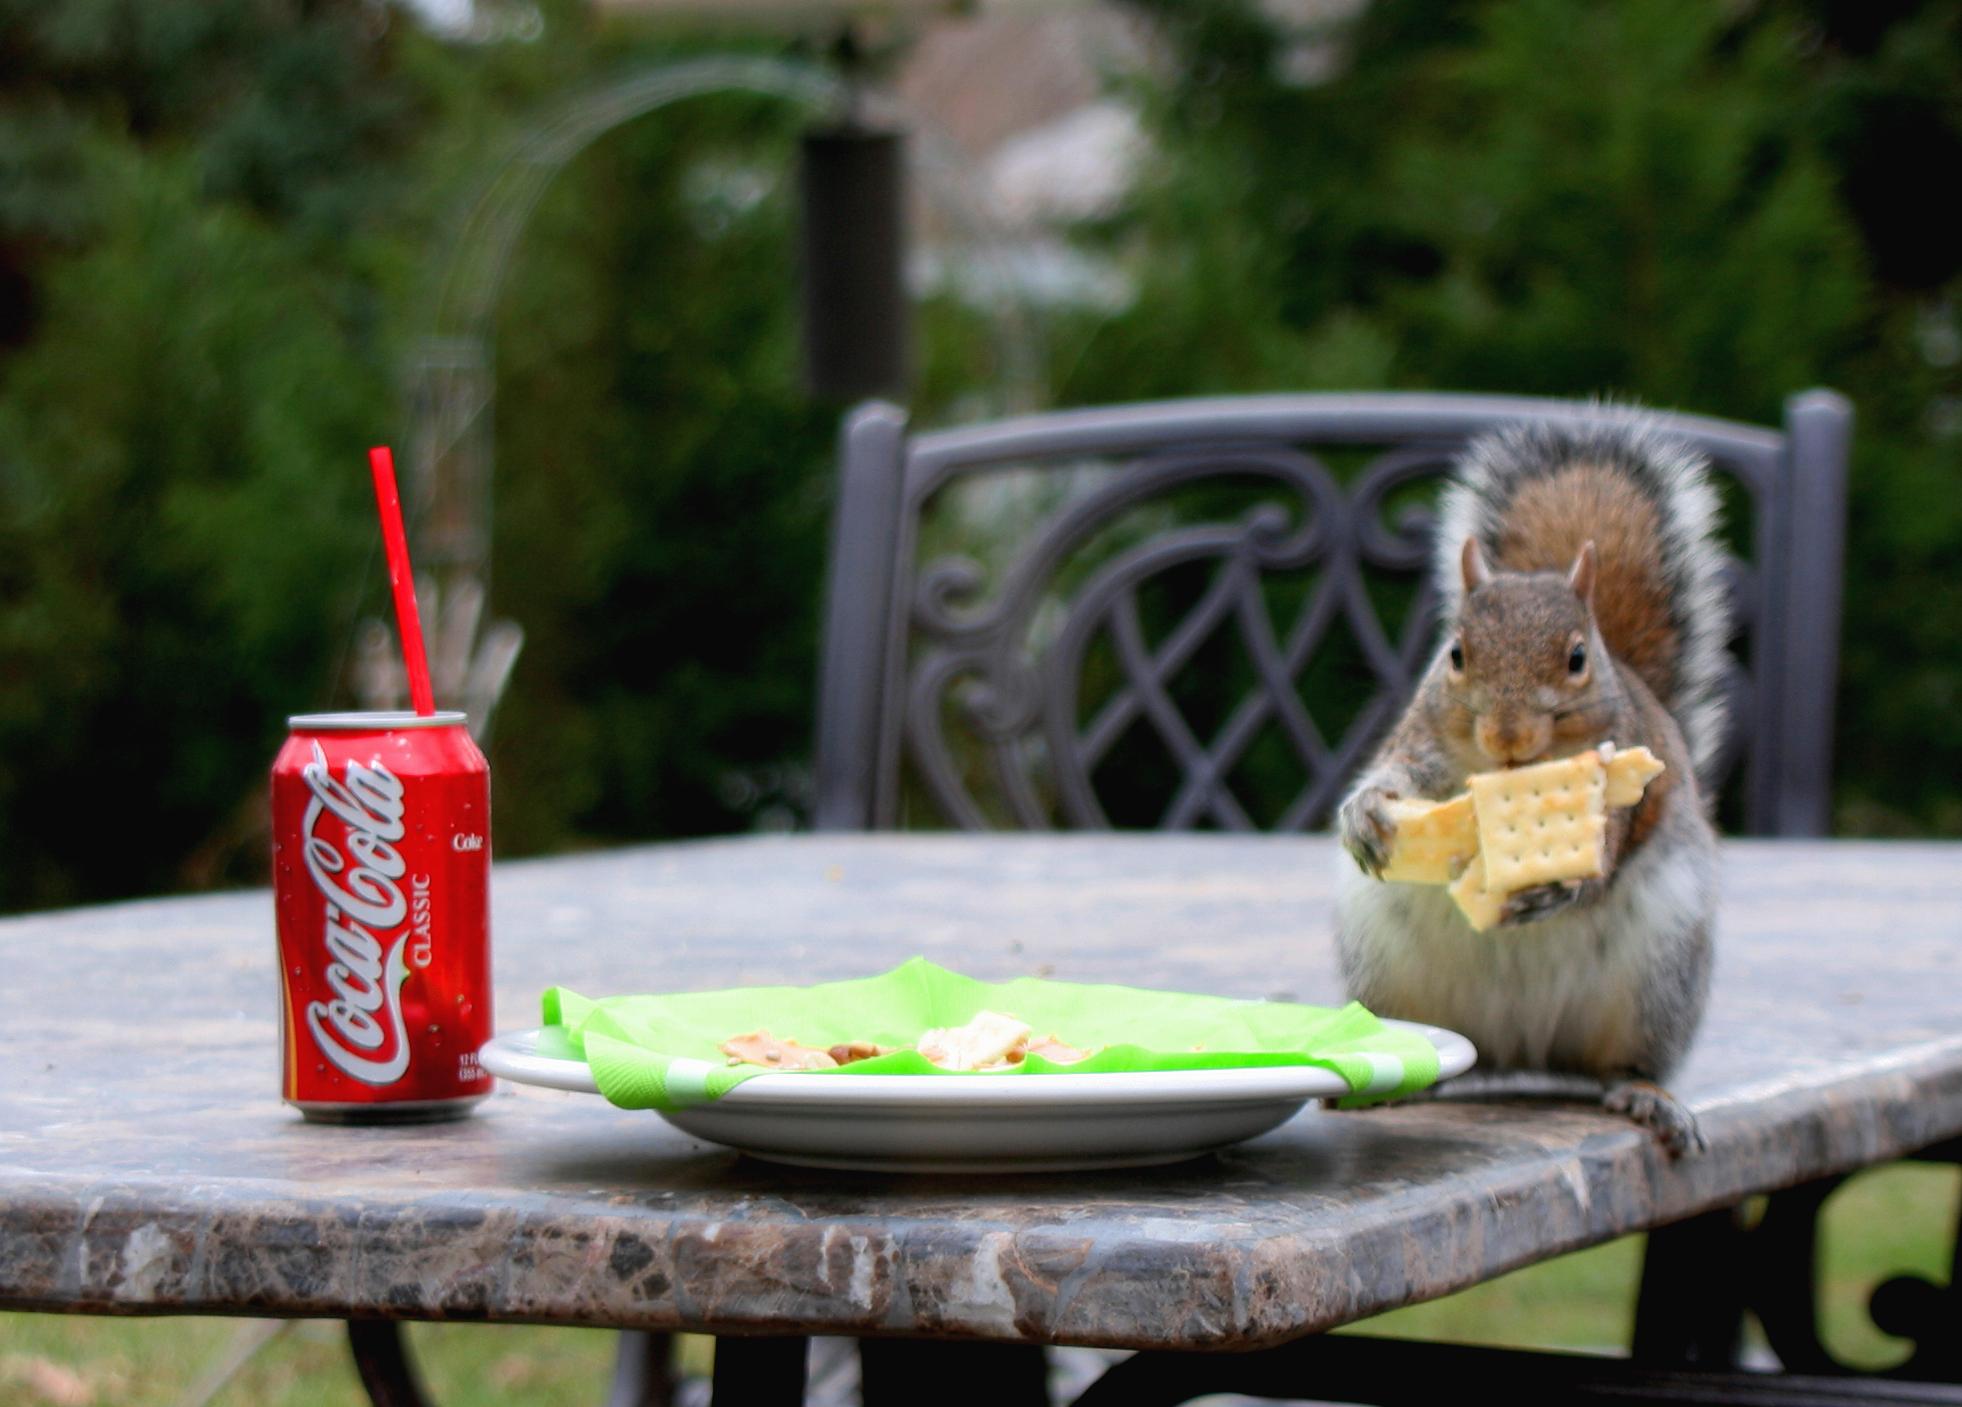 Coke squirrel 5x7 thanks